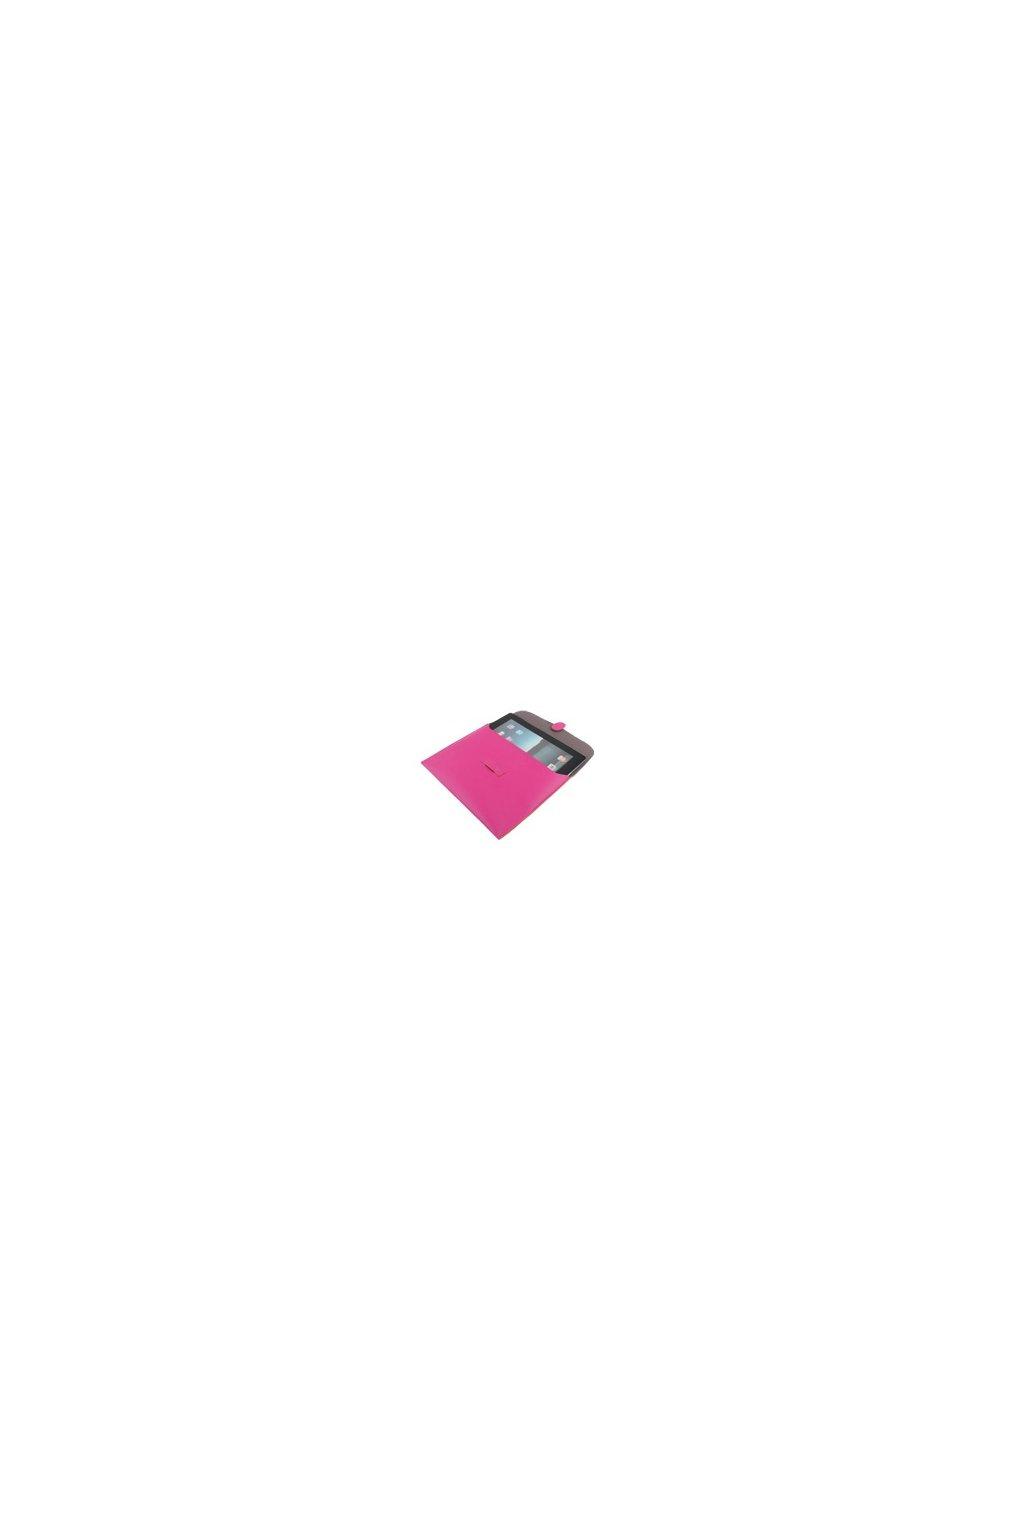 Pouzdro Omo iPad 2/3/4/Air, pink/růžová